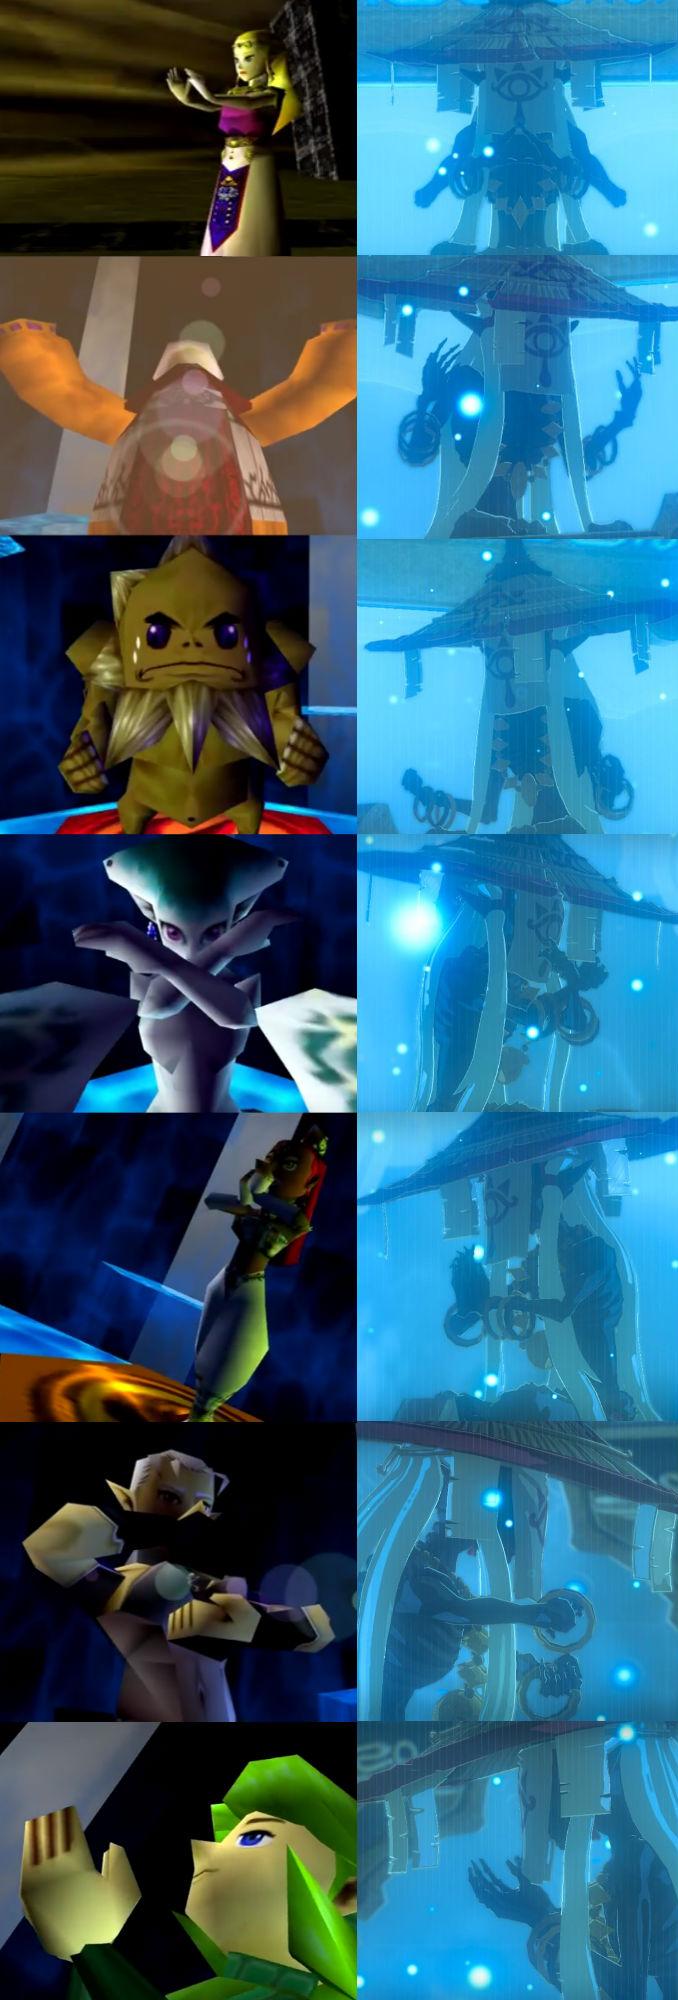 Zelda Ocarina of Time Breath of the Wild